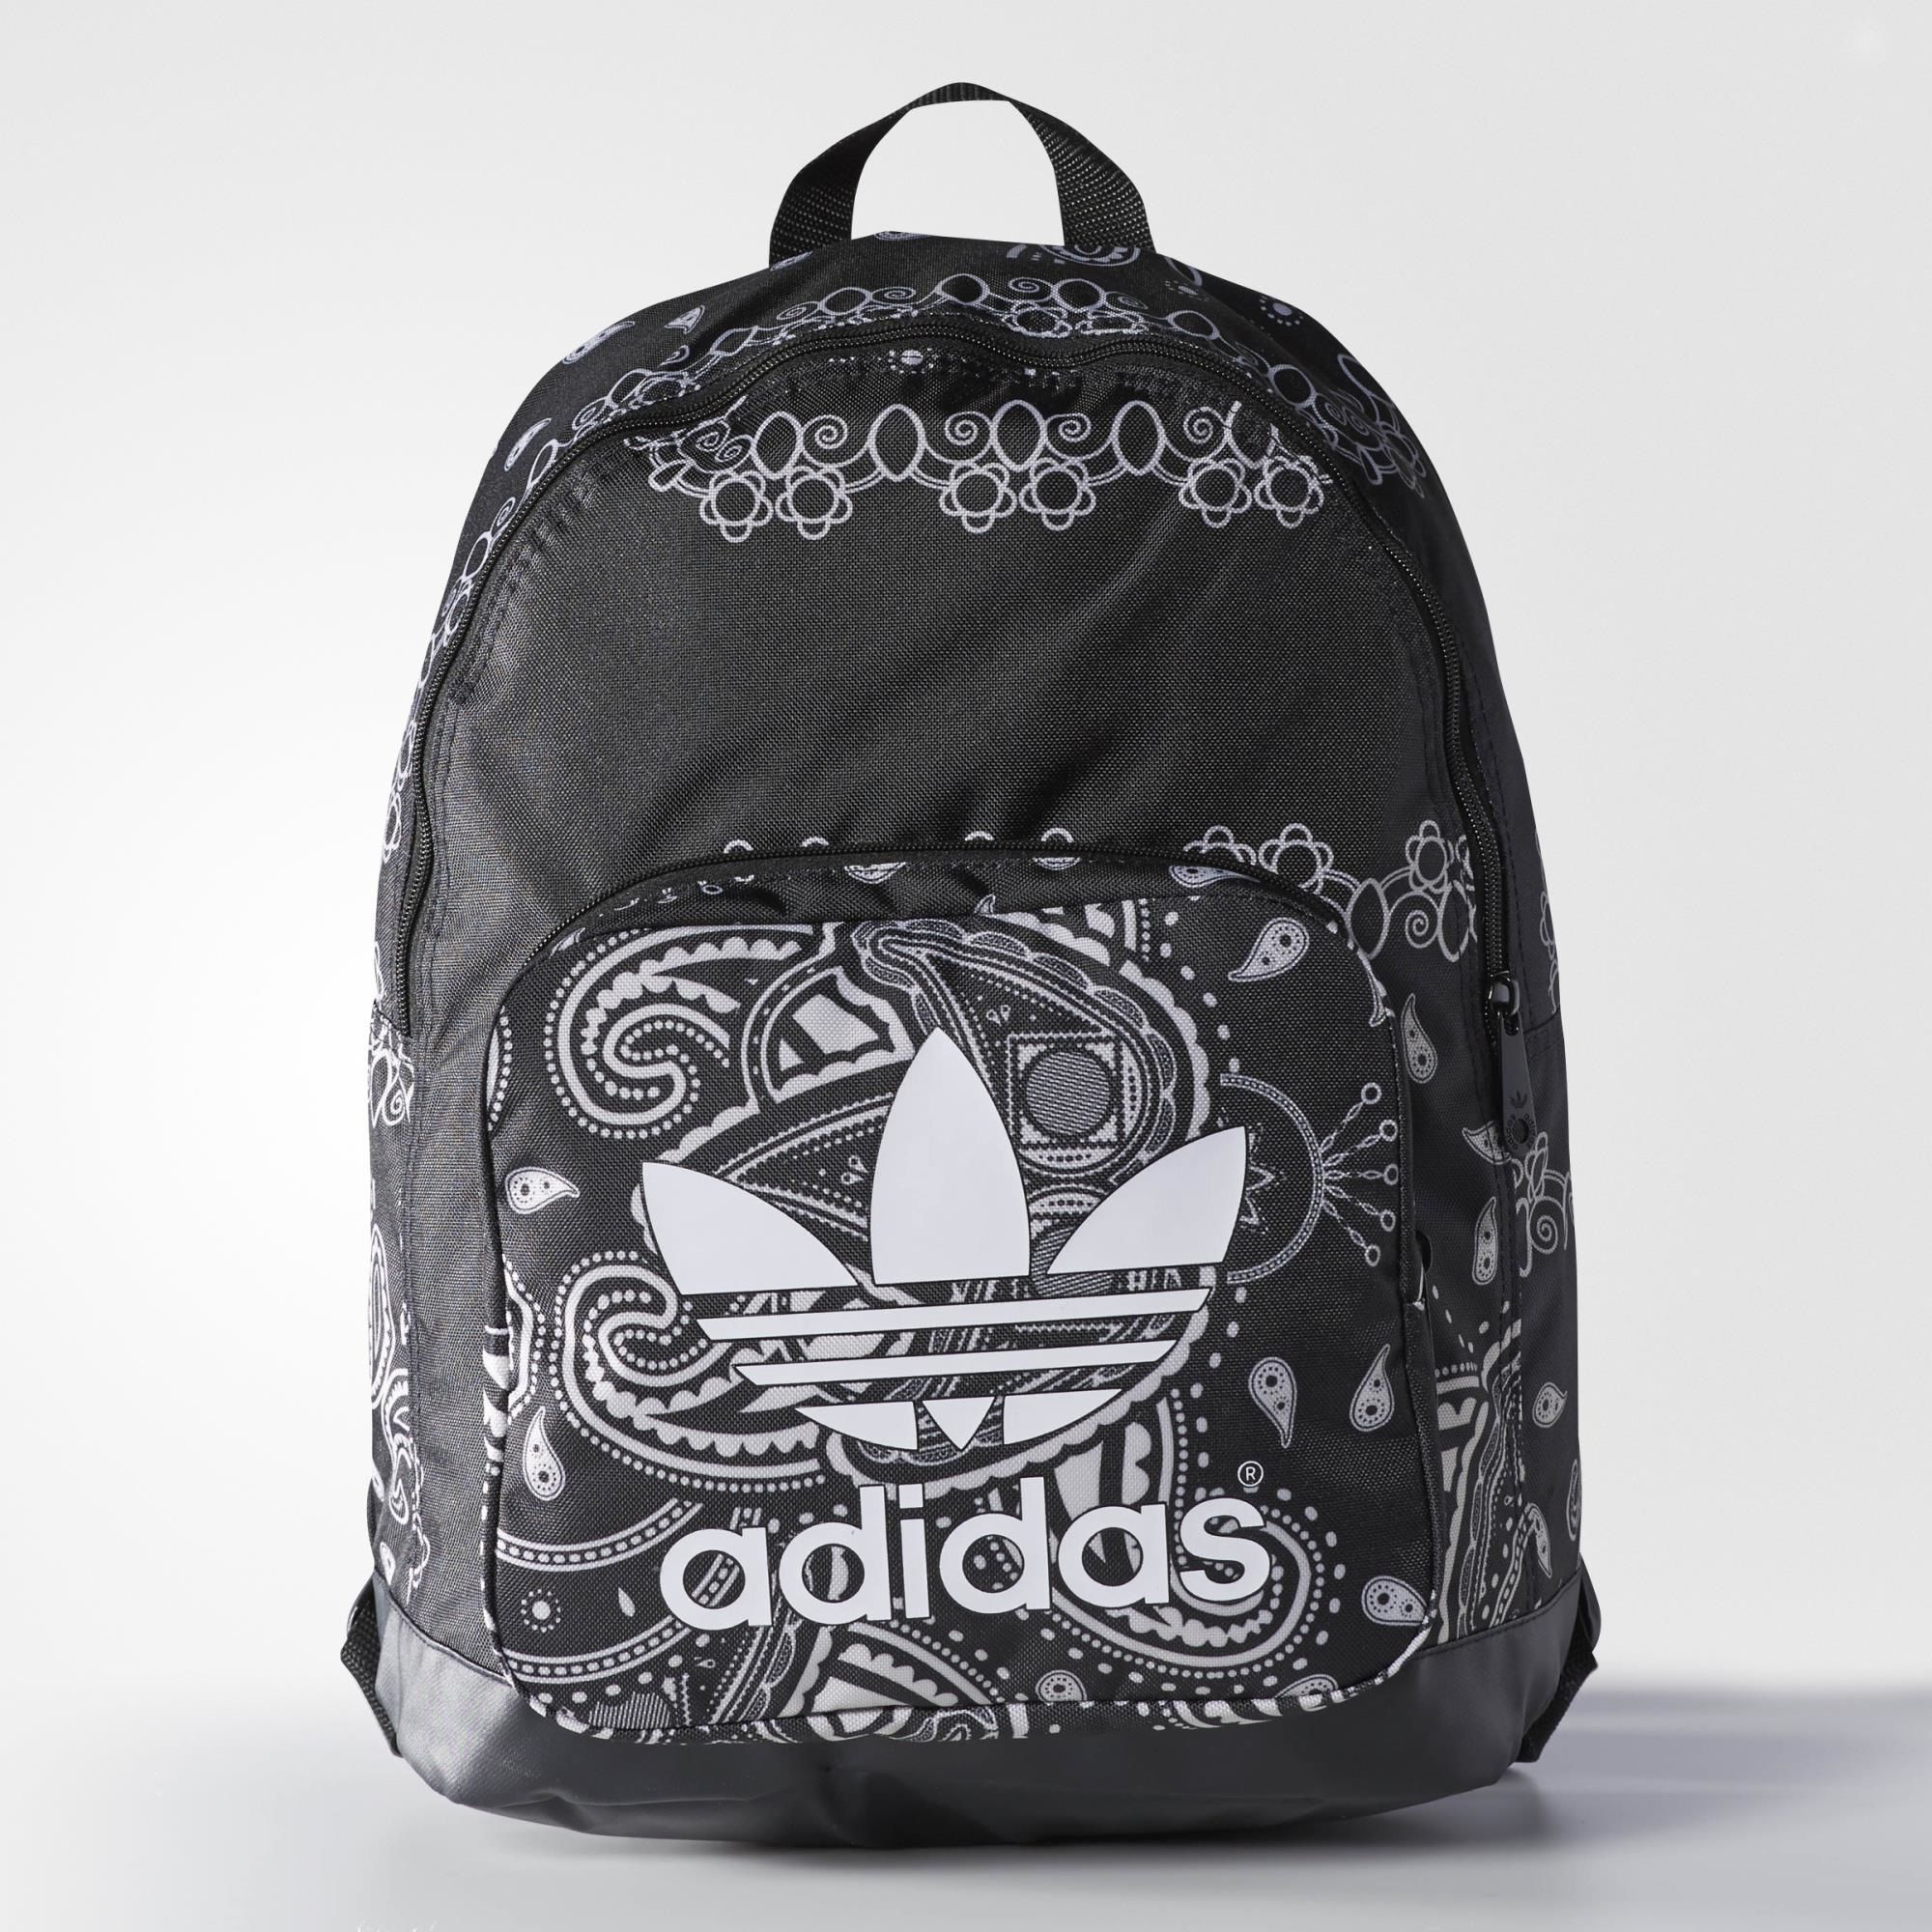 adidas paisley backpack urban fashion pinterest. Black Bedroom Furniture Sets. Home Design Ideas